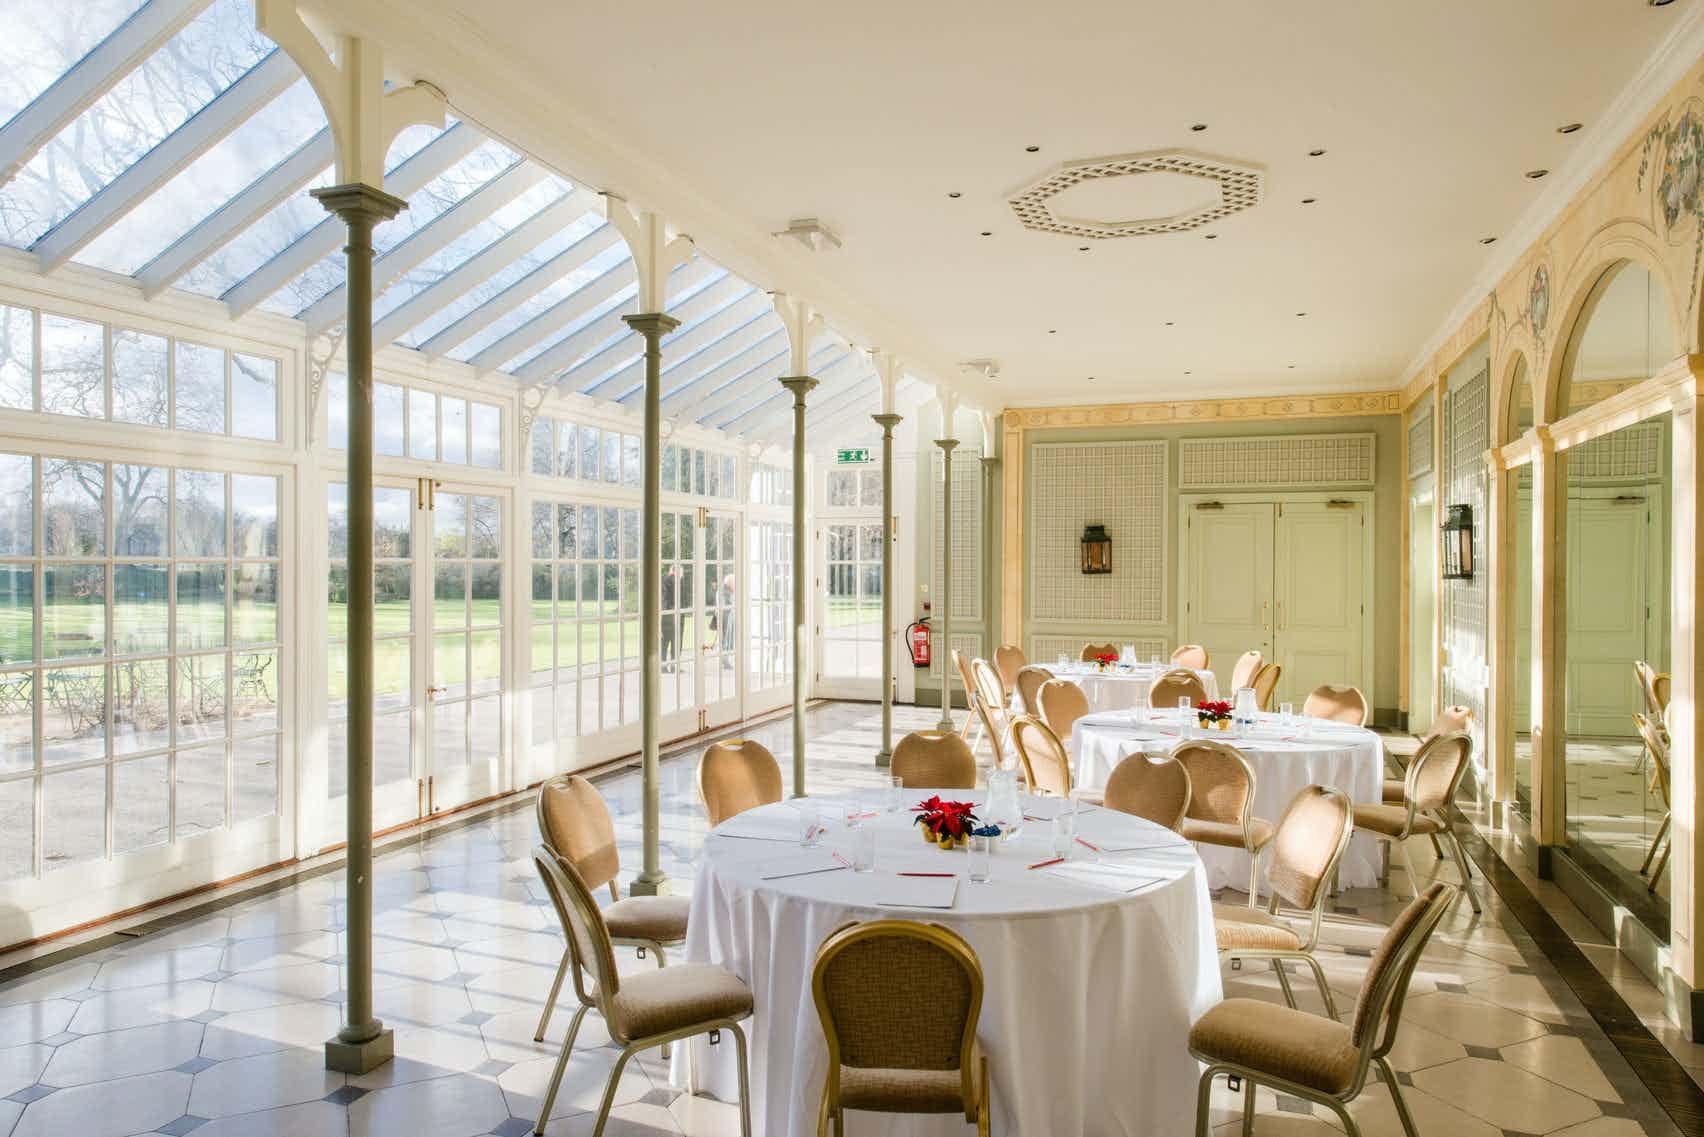 Terrace Room, The Hurlingham Club